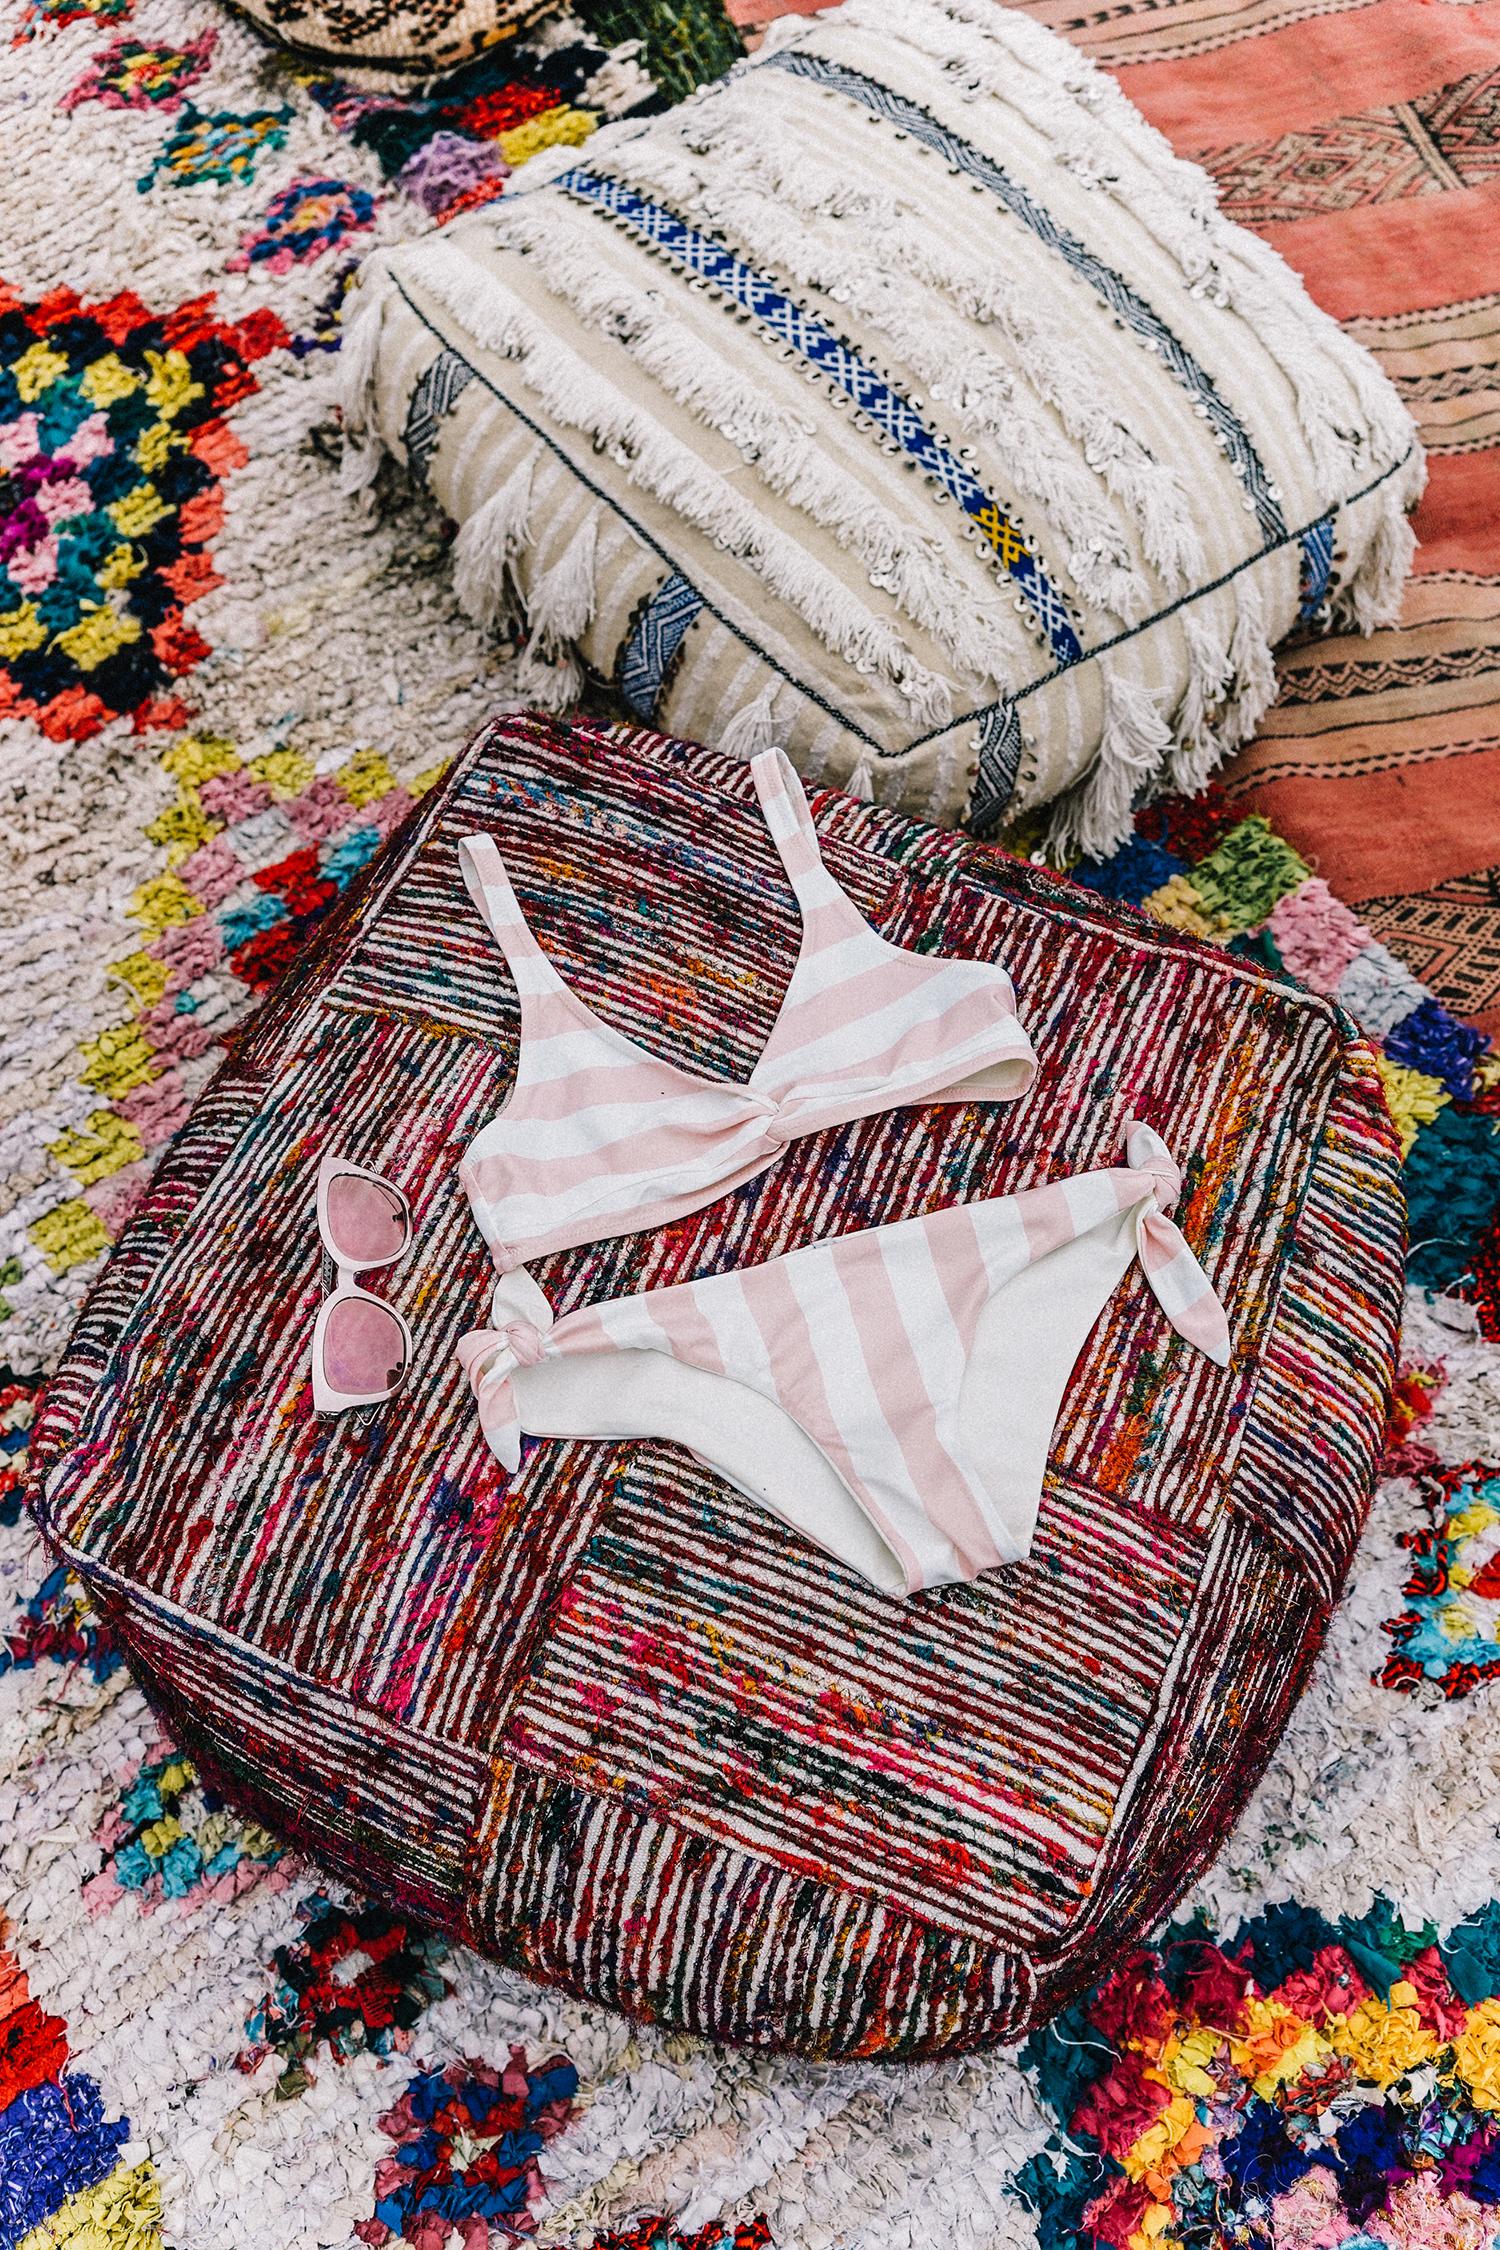 GRLFRND_Revolve_in_The_Hamptons-Denim_Skirt-Outfit-Collage_Vintage-64